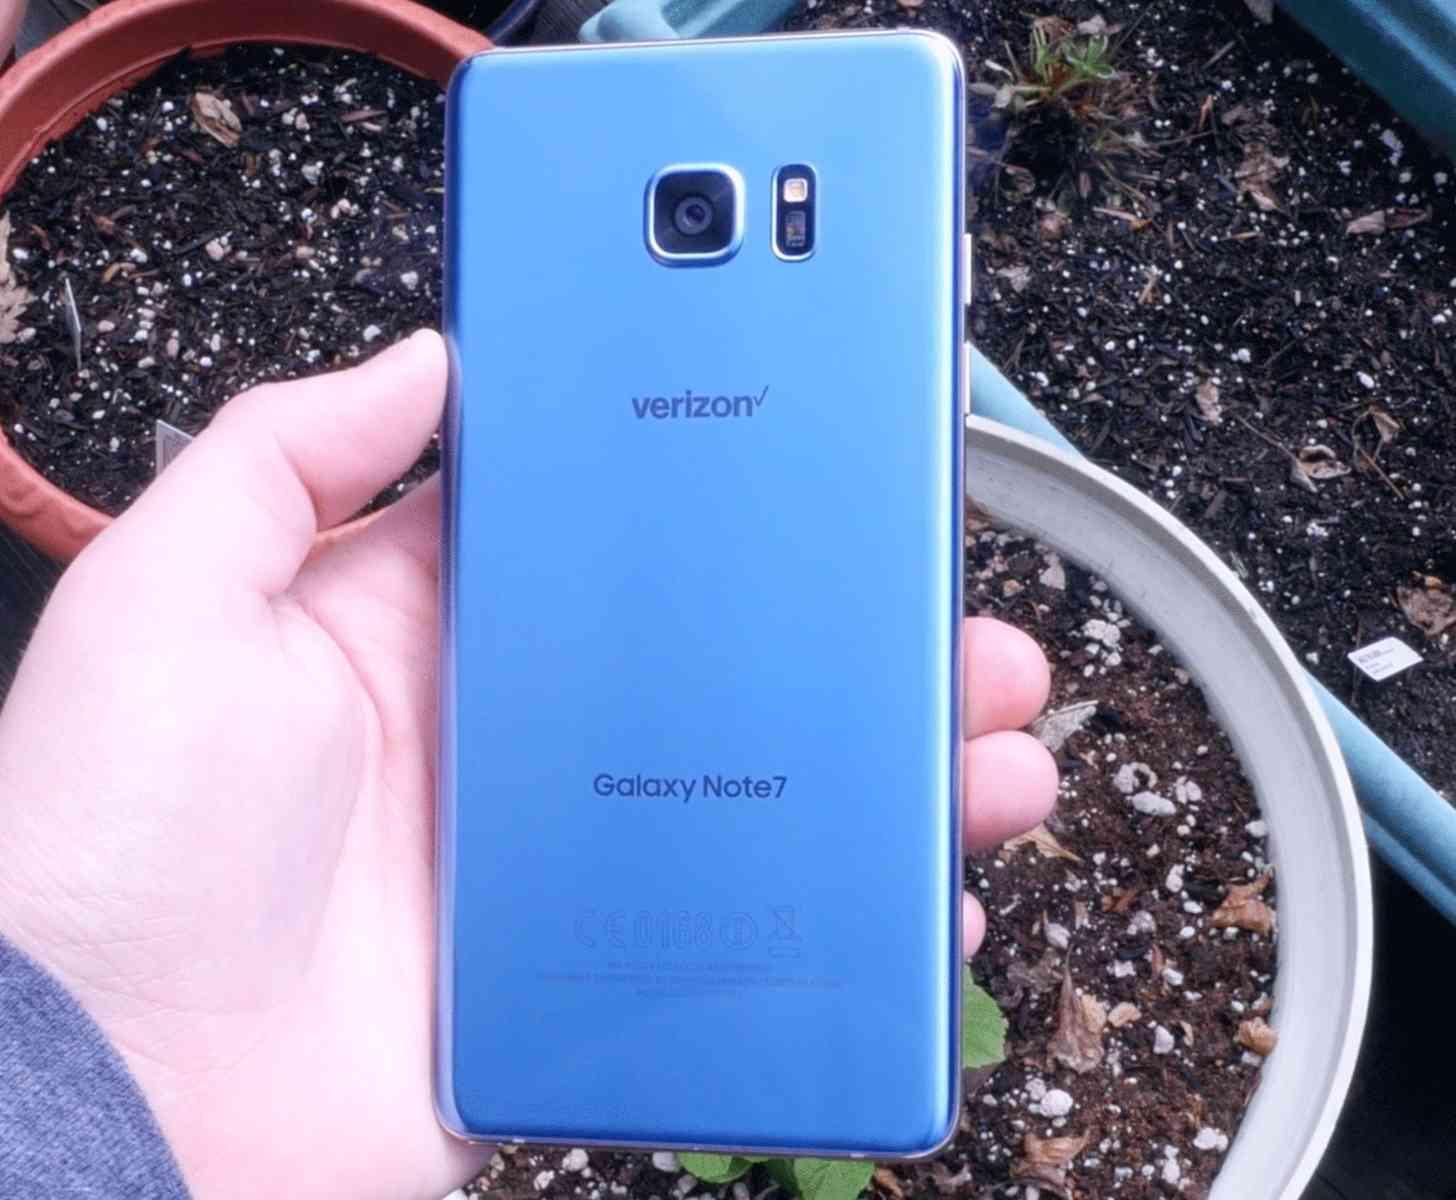 Verizon Galaxy Note 7 hands-on Blue Coral